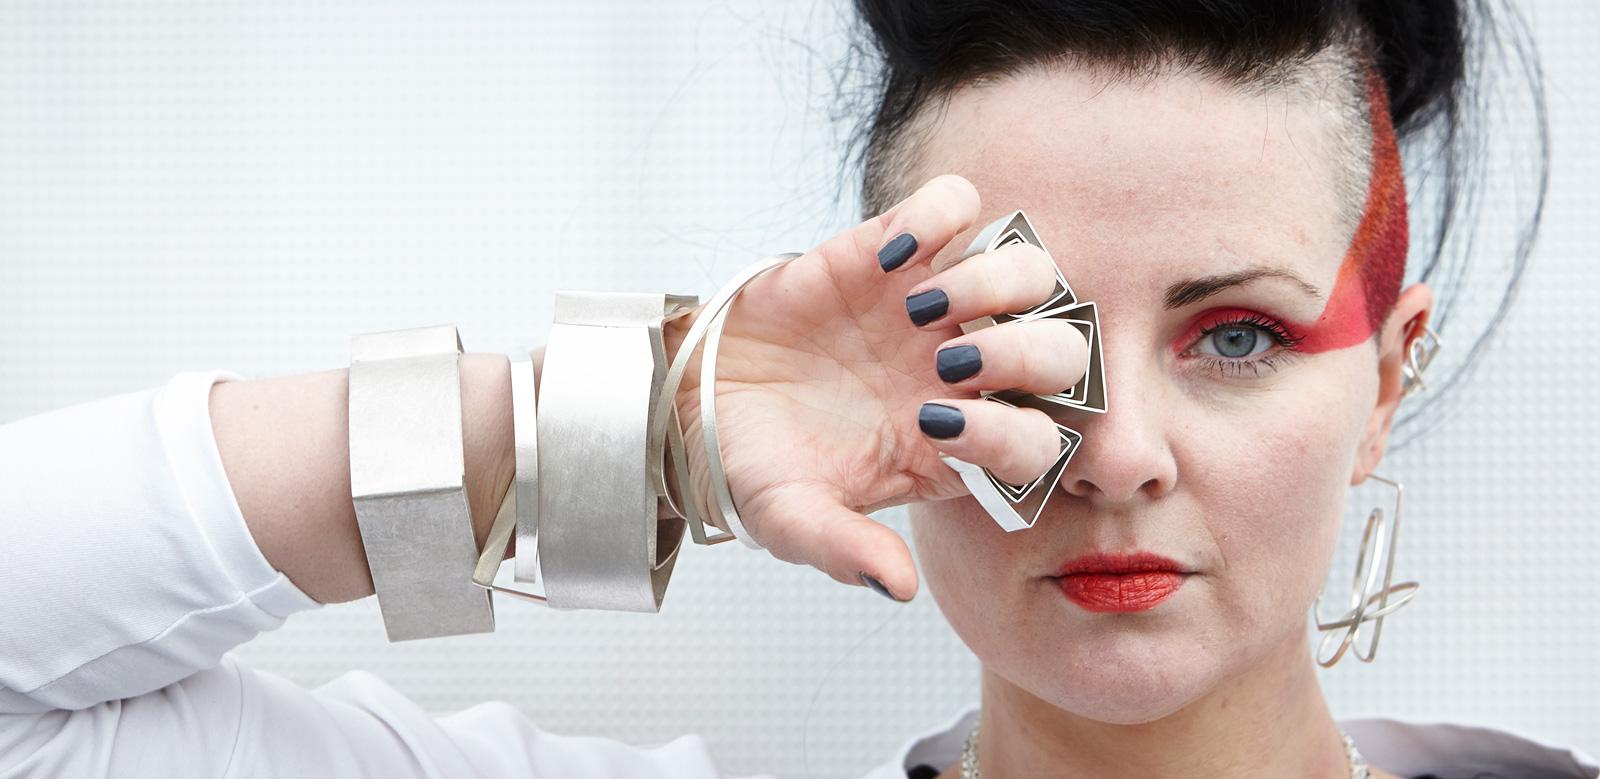 jewellery2829-crop-72.jpg